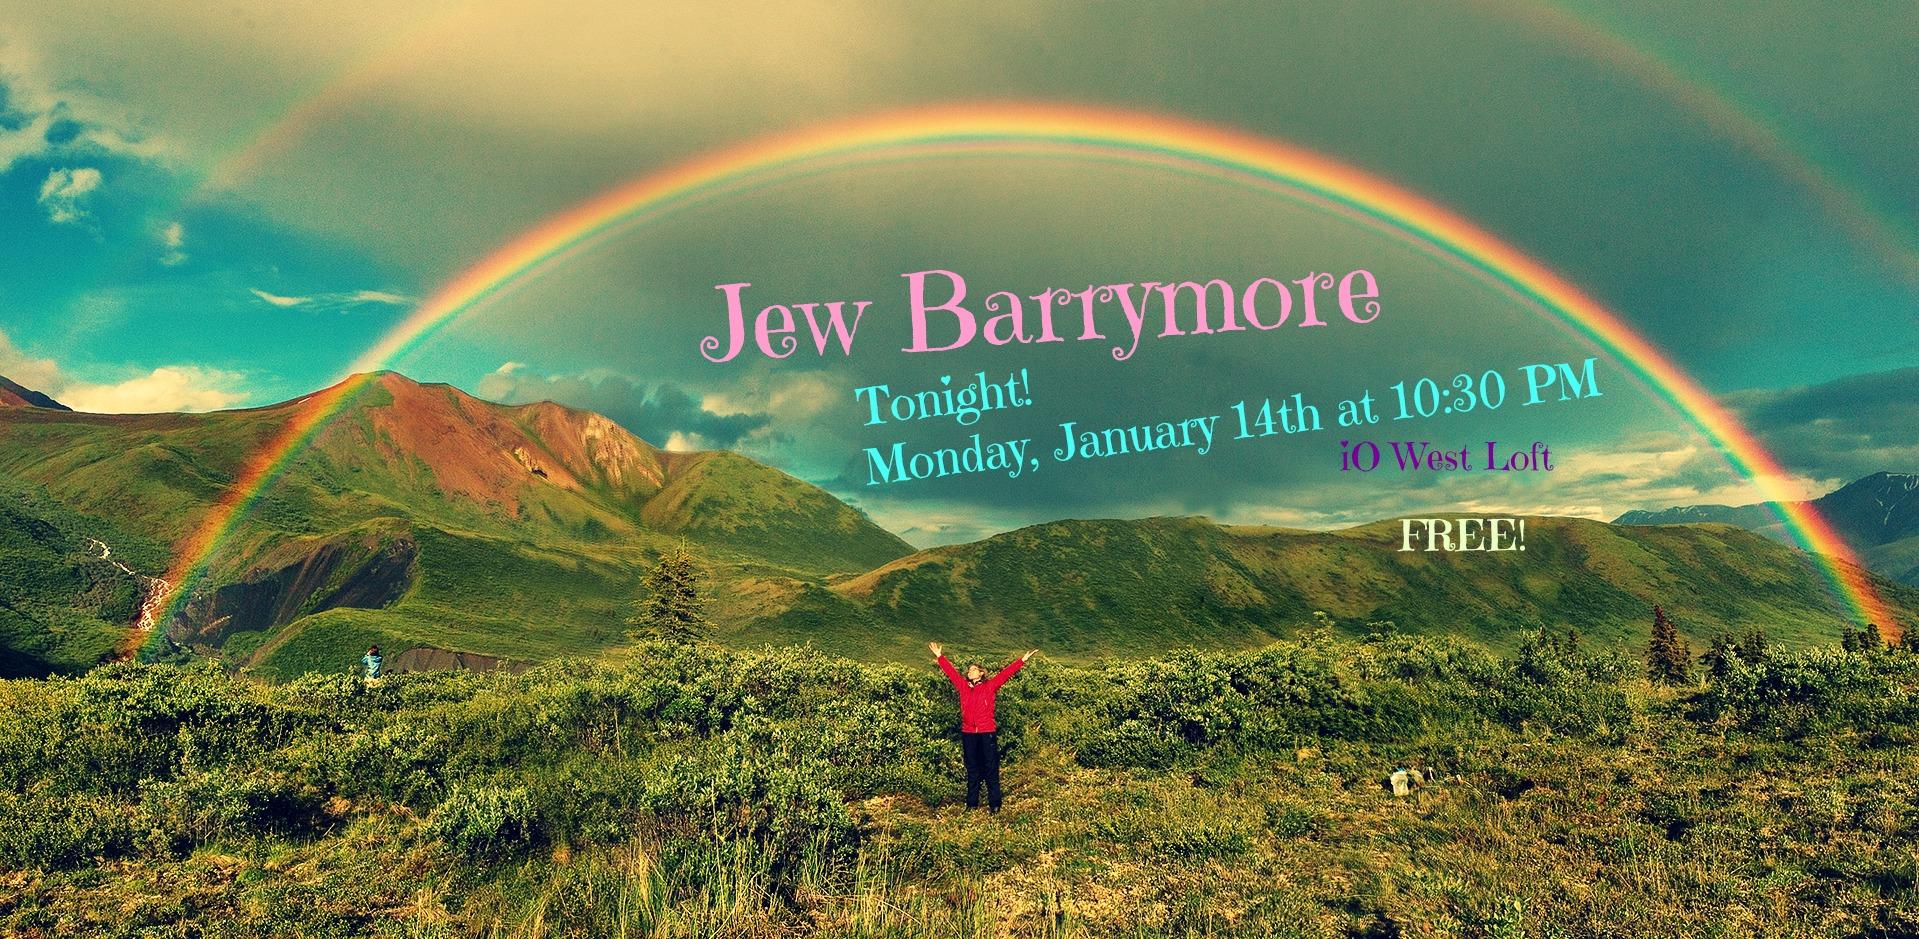 Jew Barrymore LIVE iO West